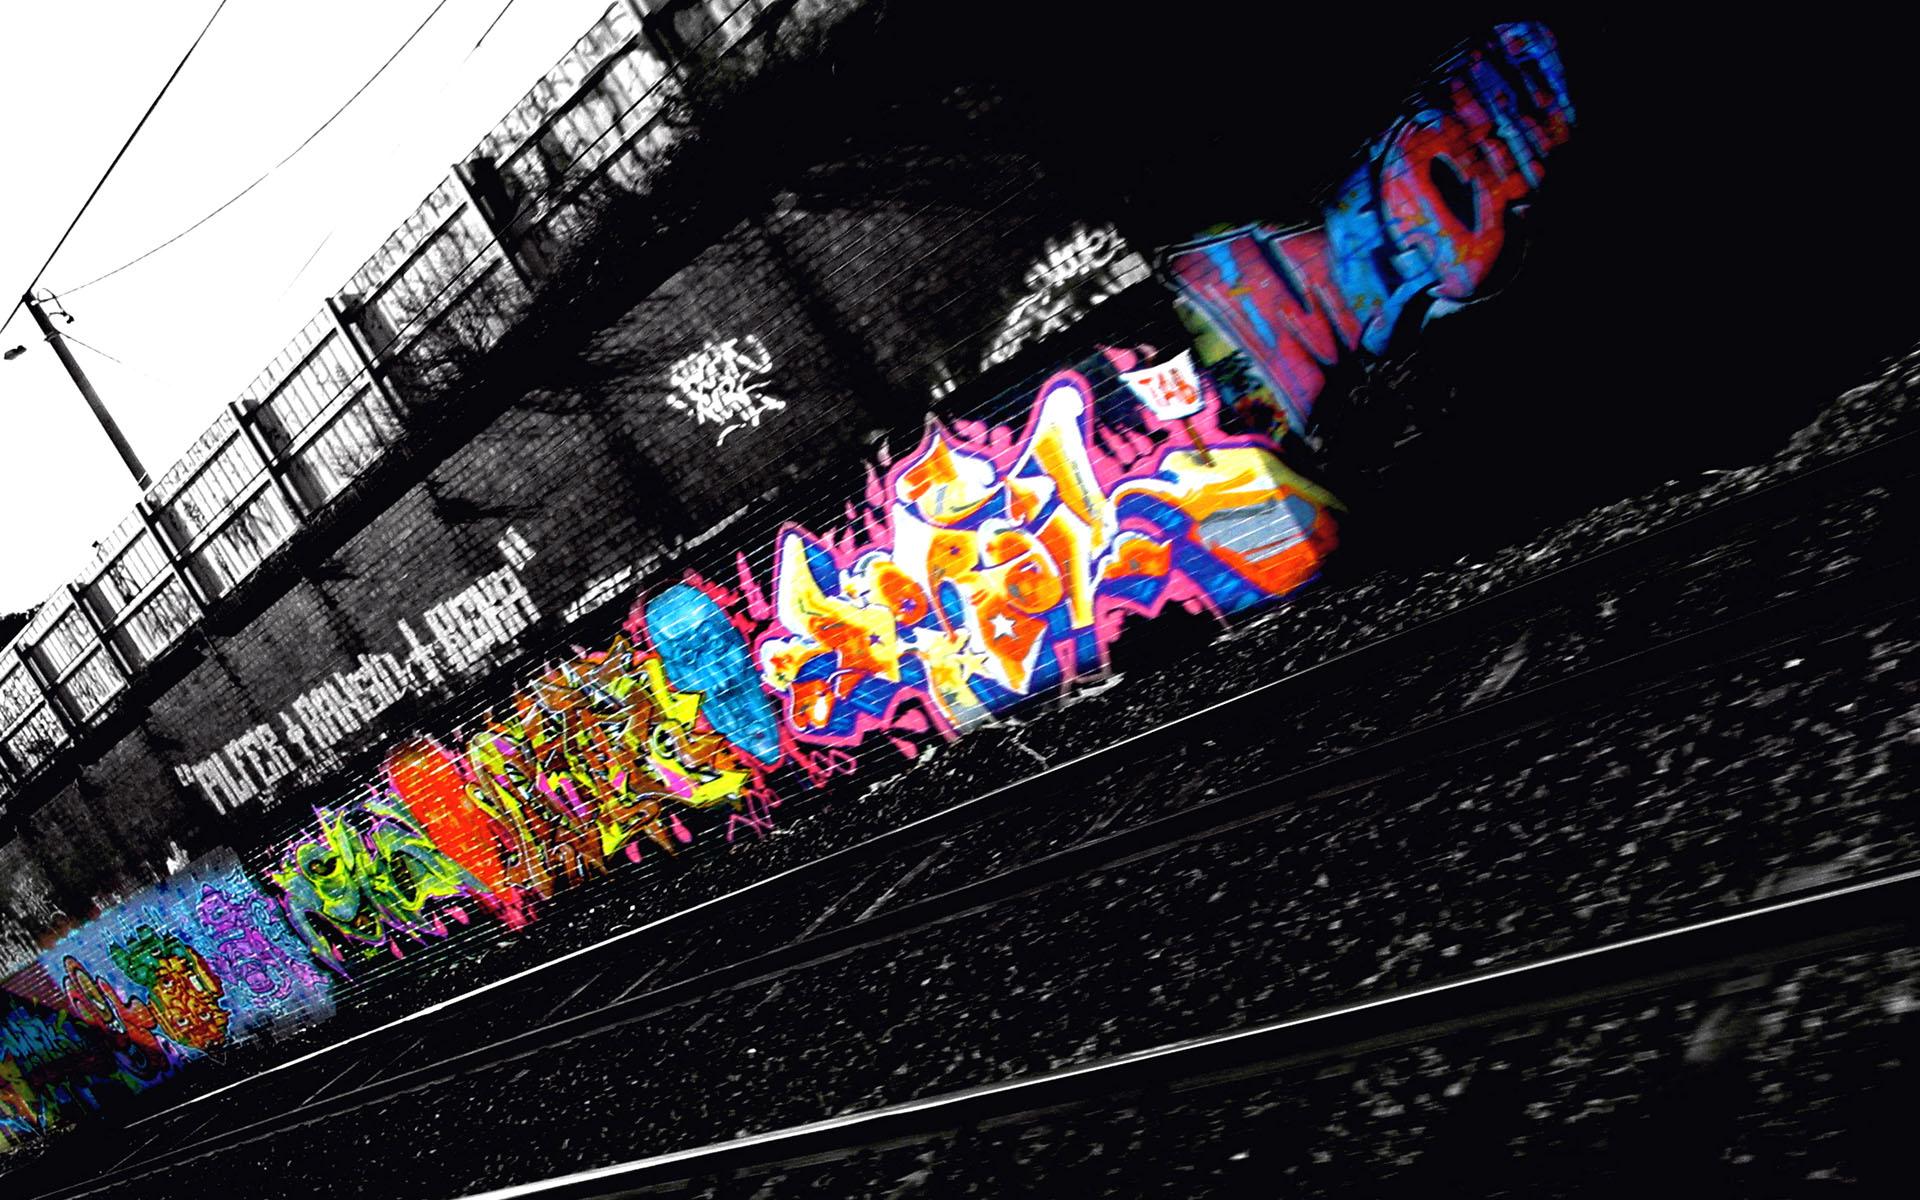 Graffiti Computer Wallpapers Desktop Backgrounds 1920x1200 ID 1920x1200